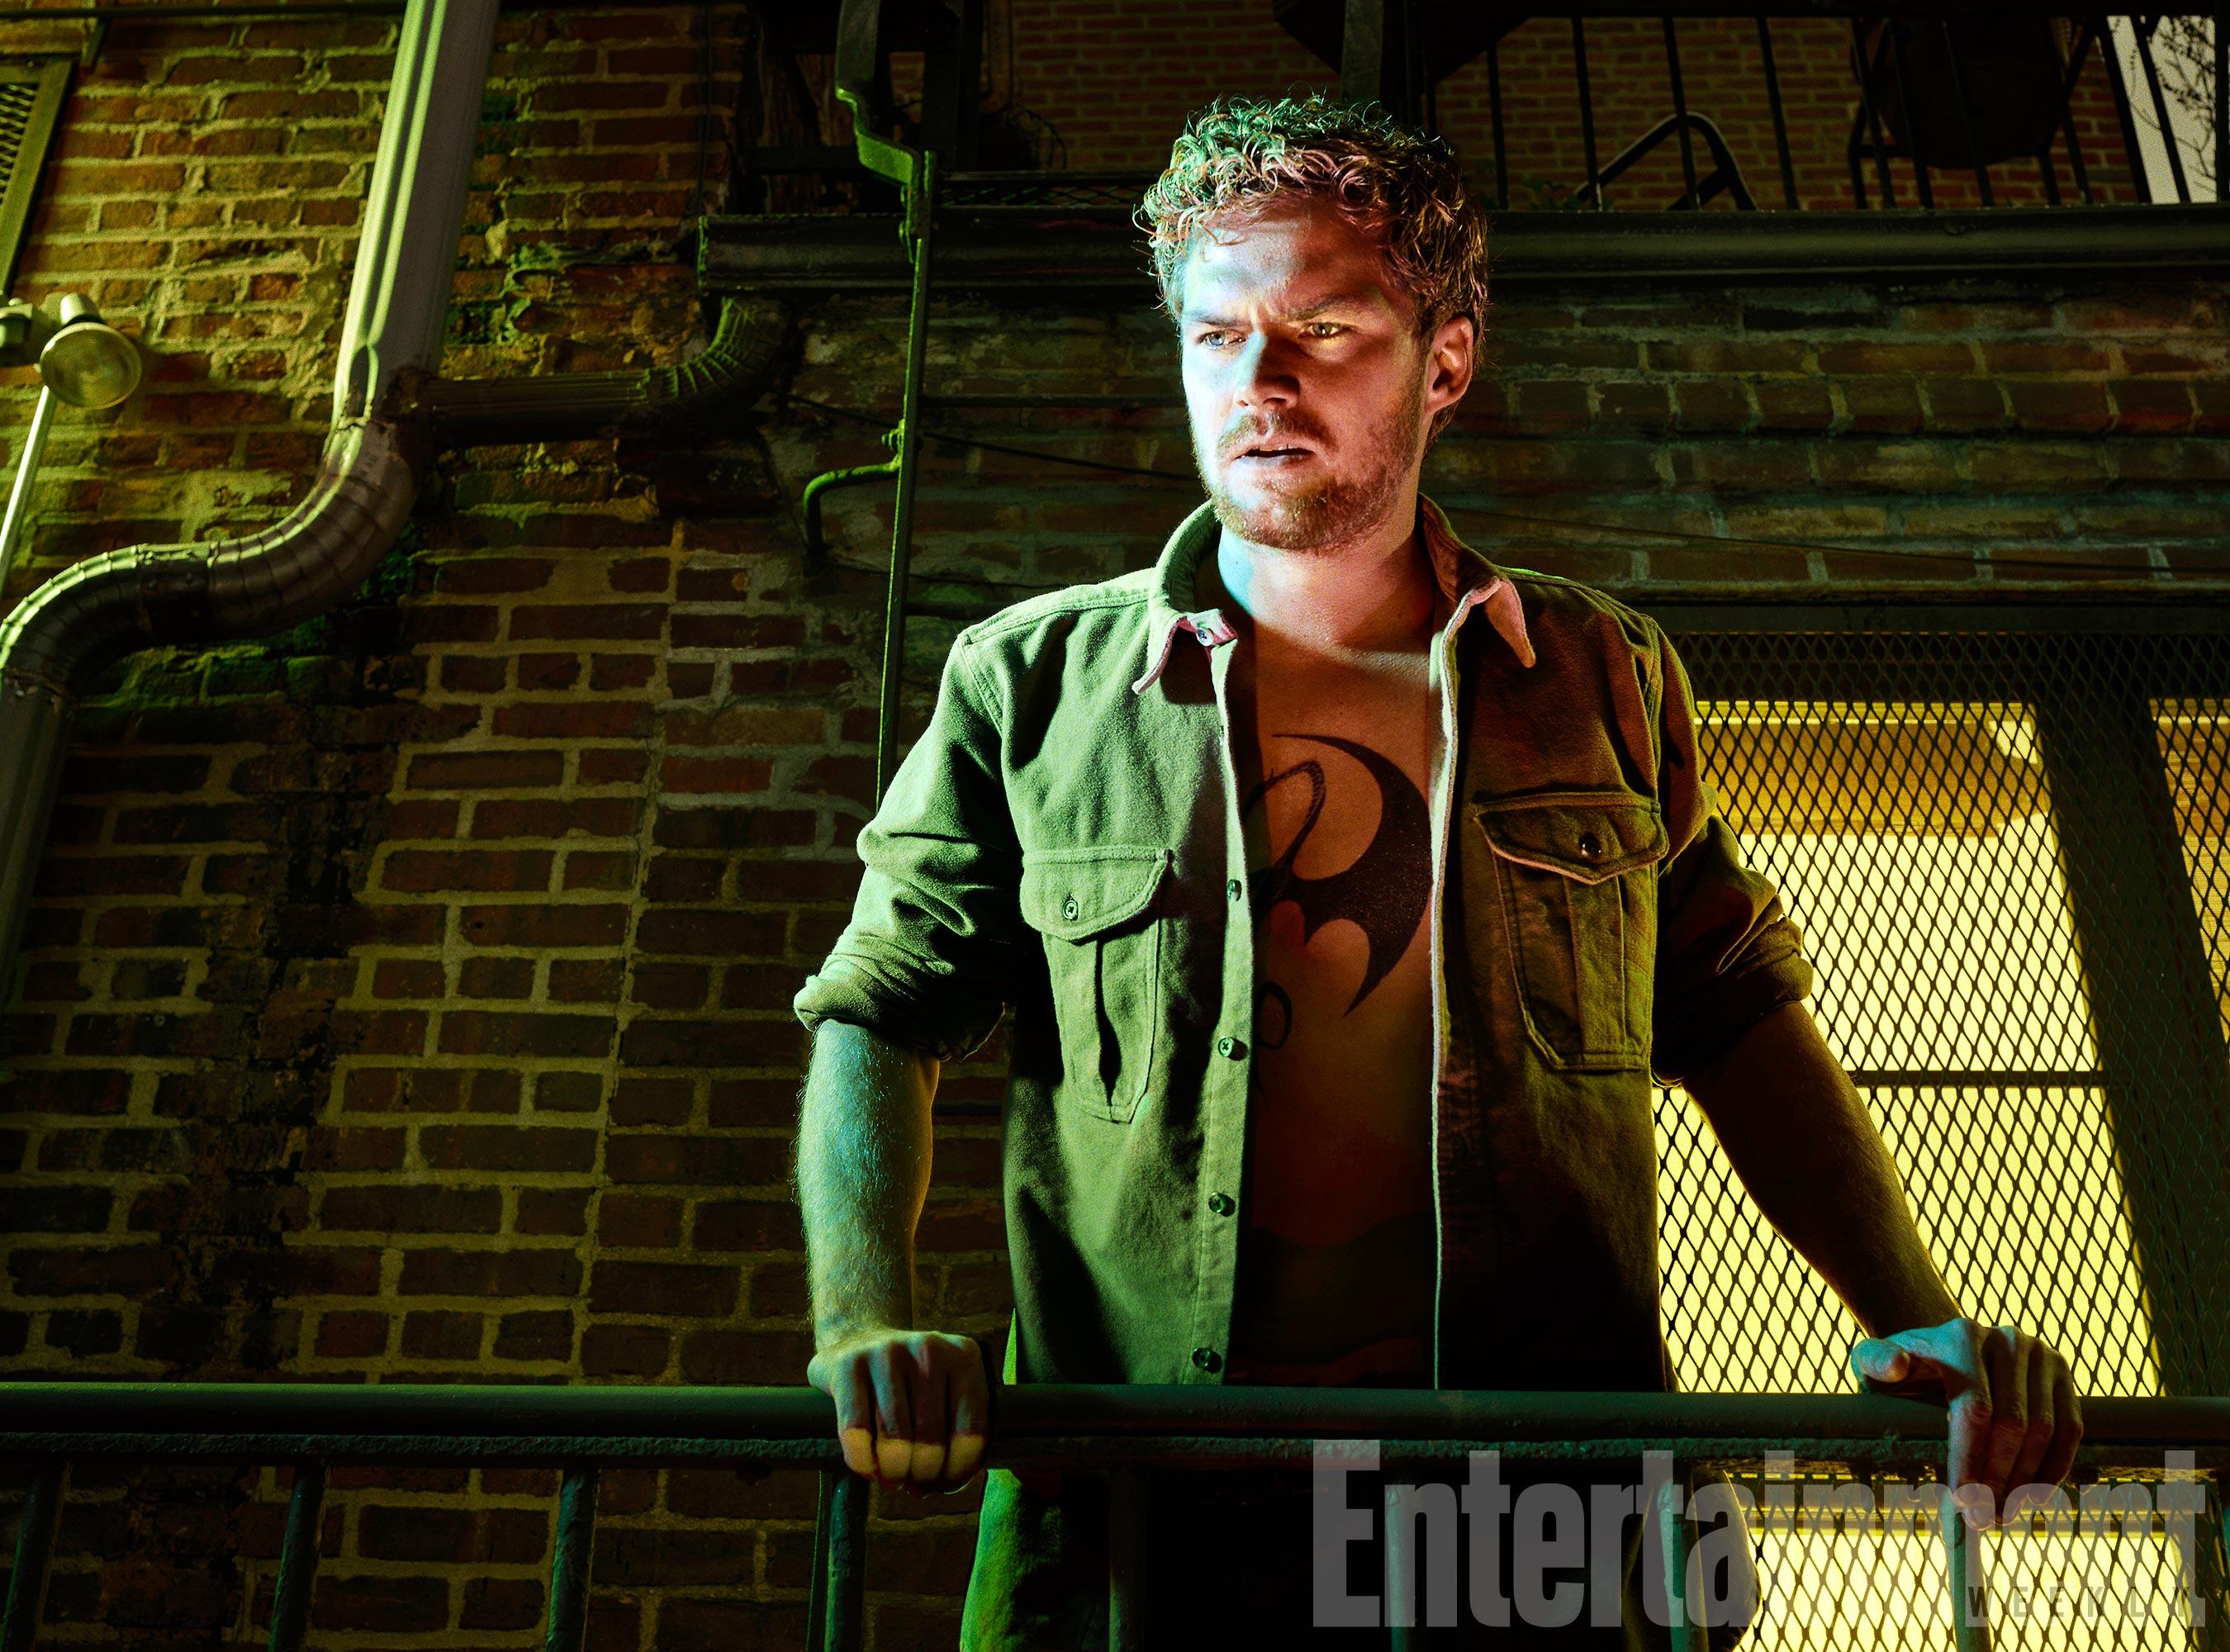 Danny Rand, aka Iron Fist